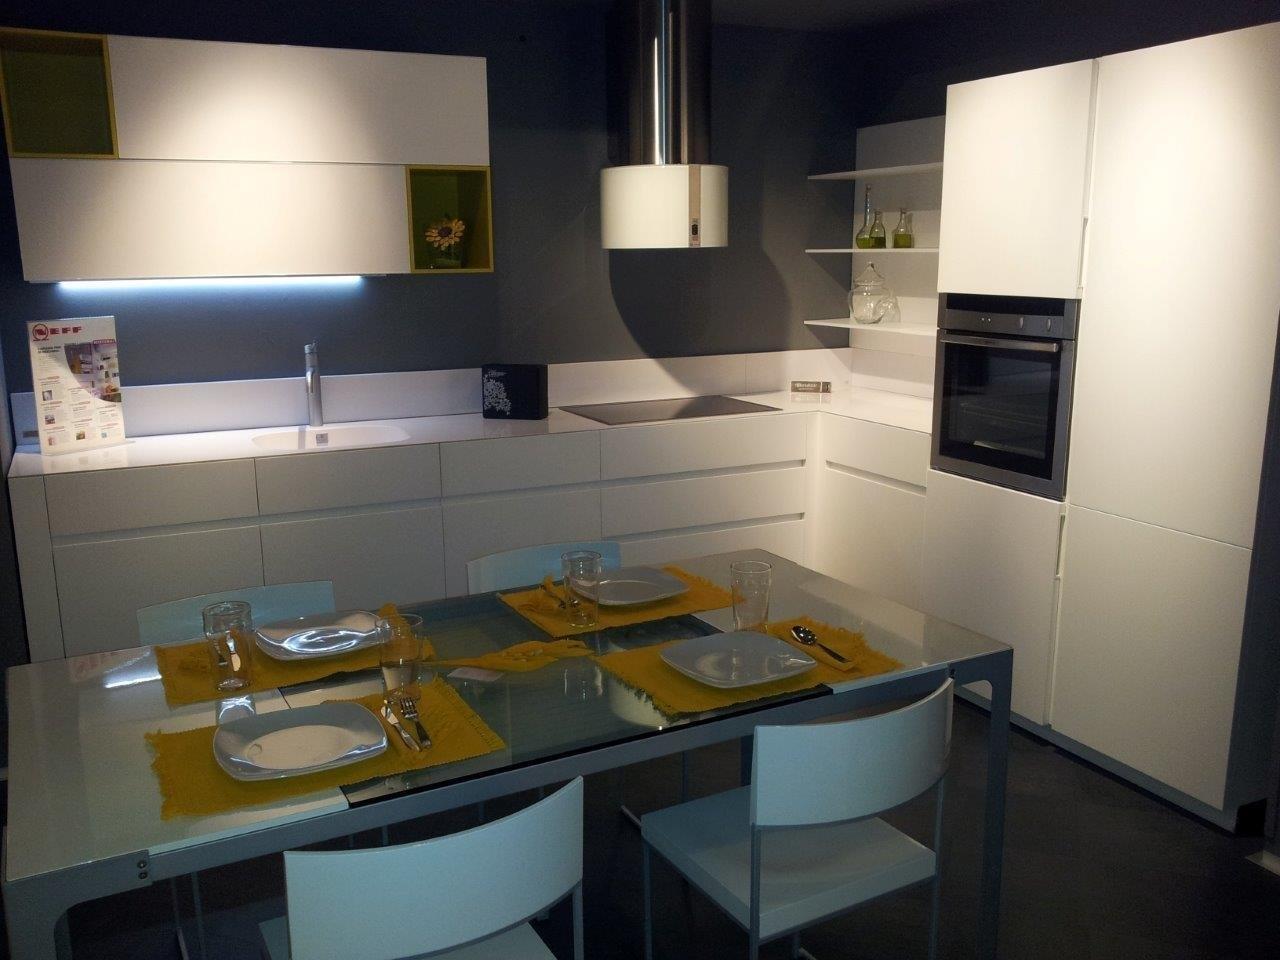 Cucina cesar elle scontata cucine a prezzi scontati - Taglio top cucina ...